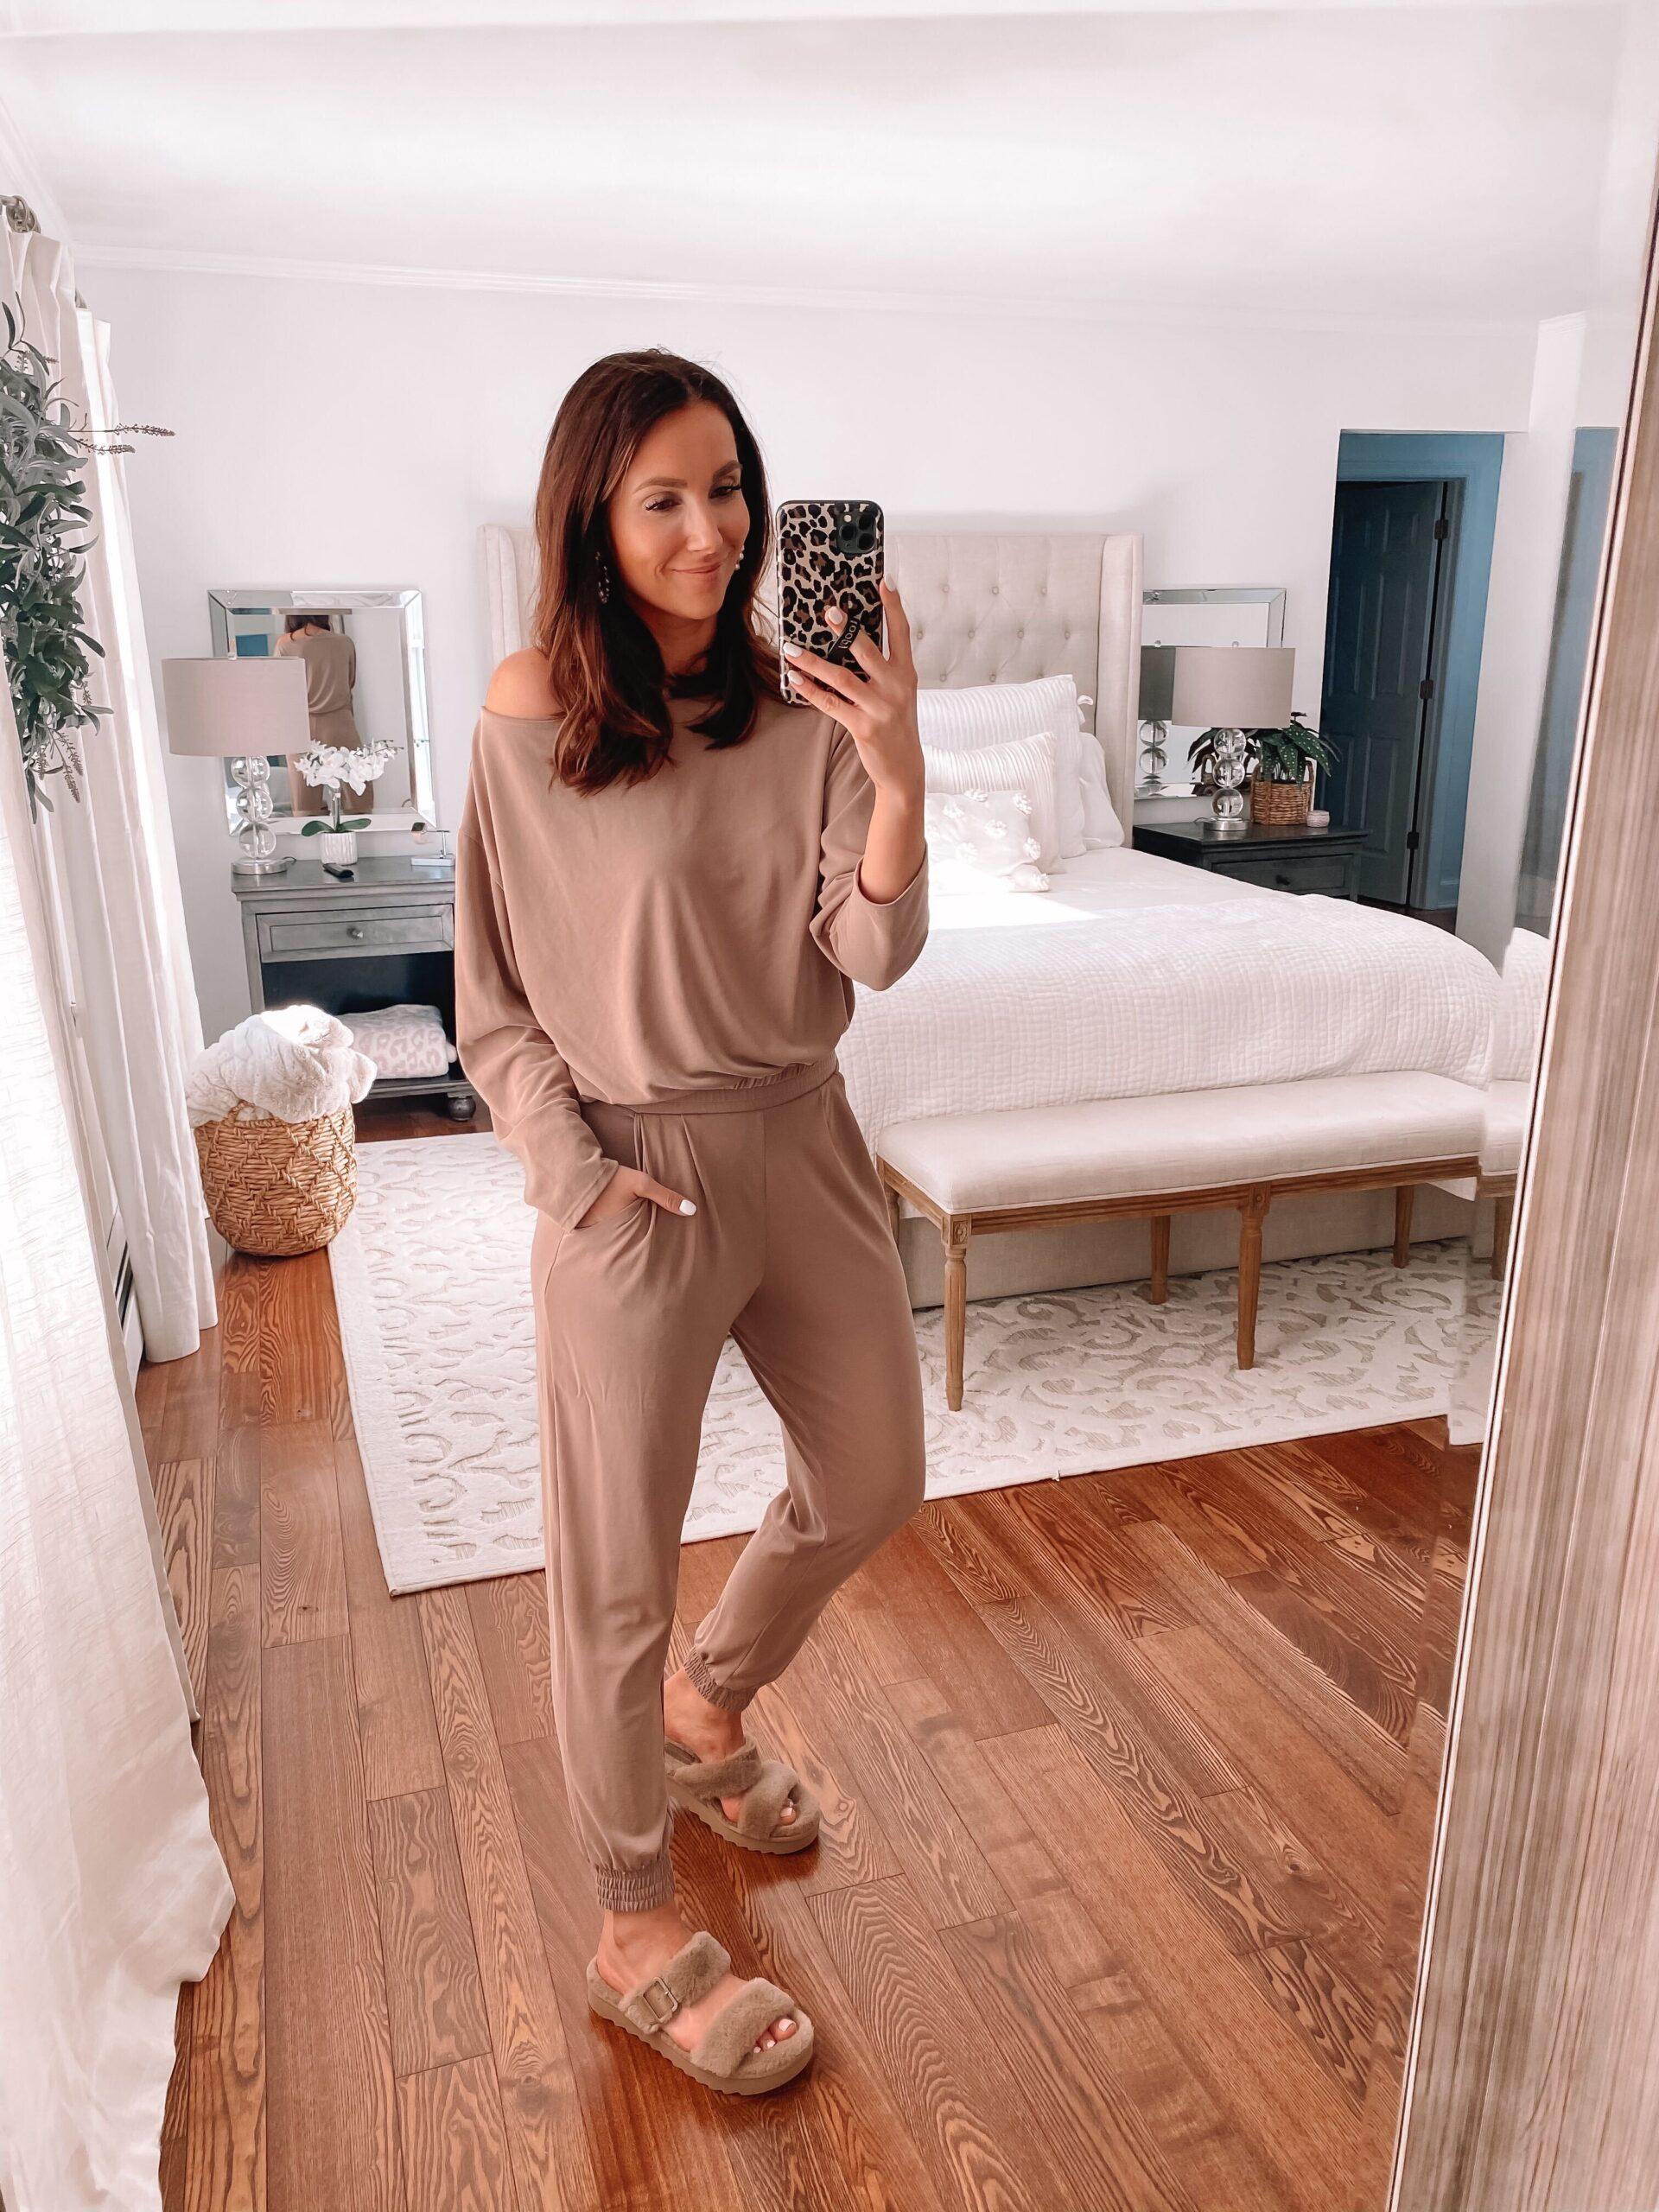 express loungewear, koolaburra slippers